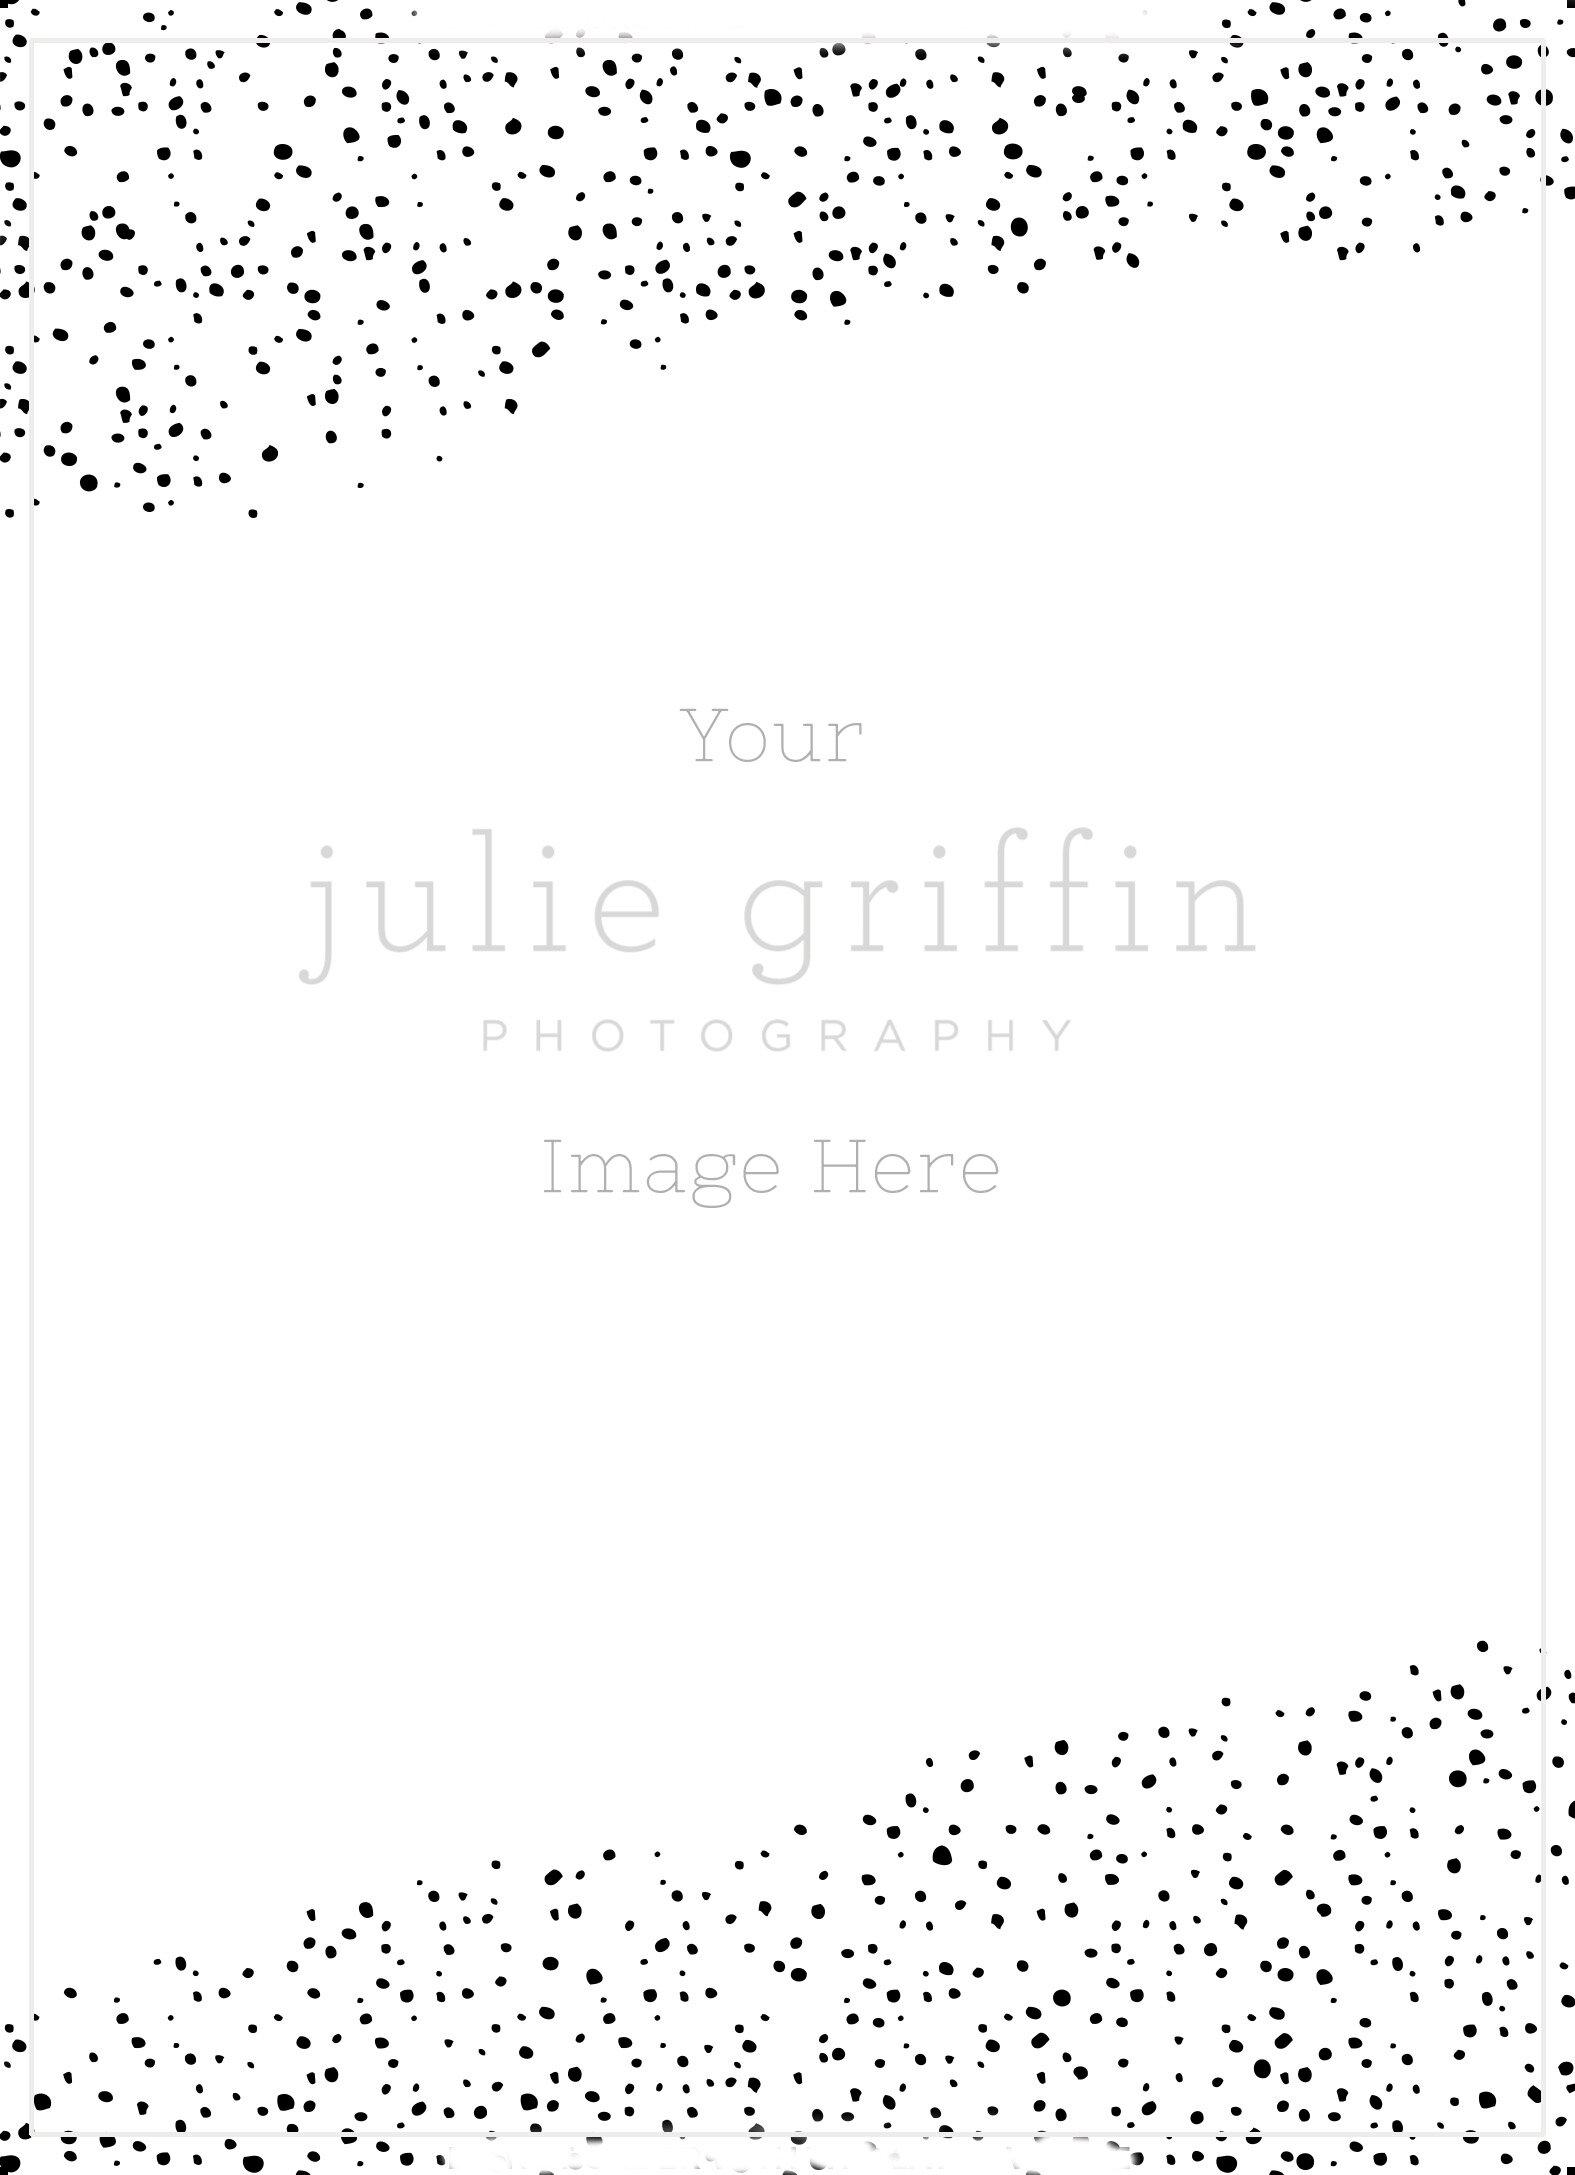 JGPDesign02-Confetti.jpg